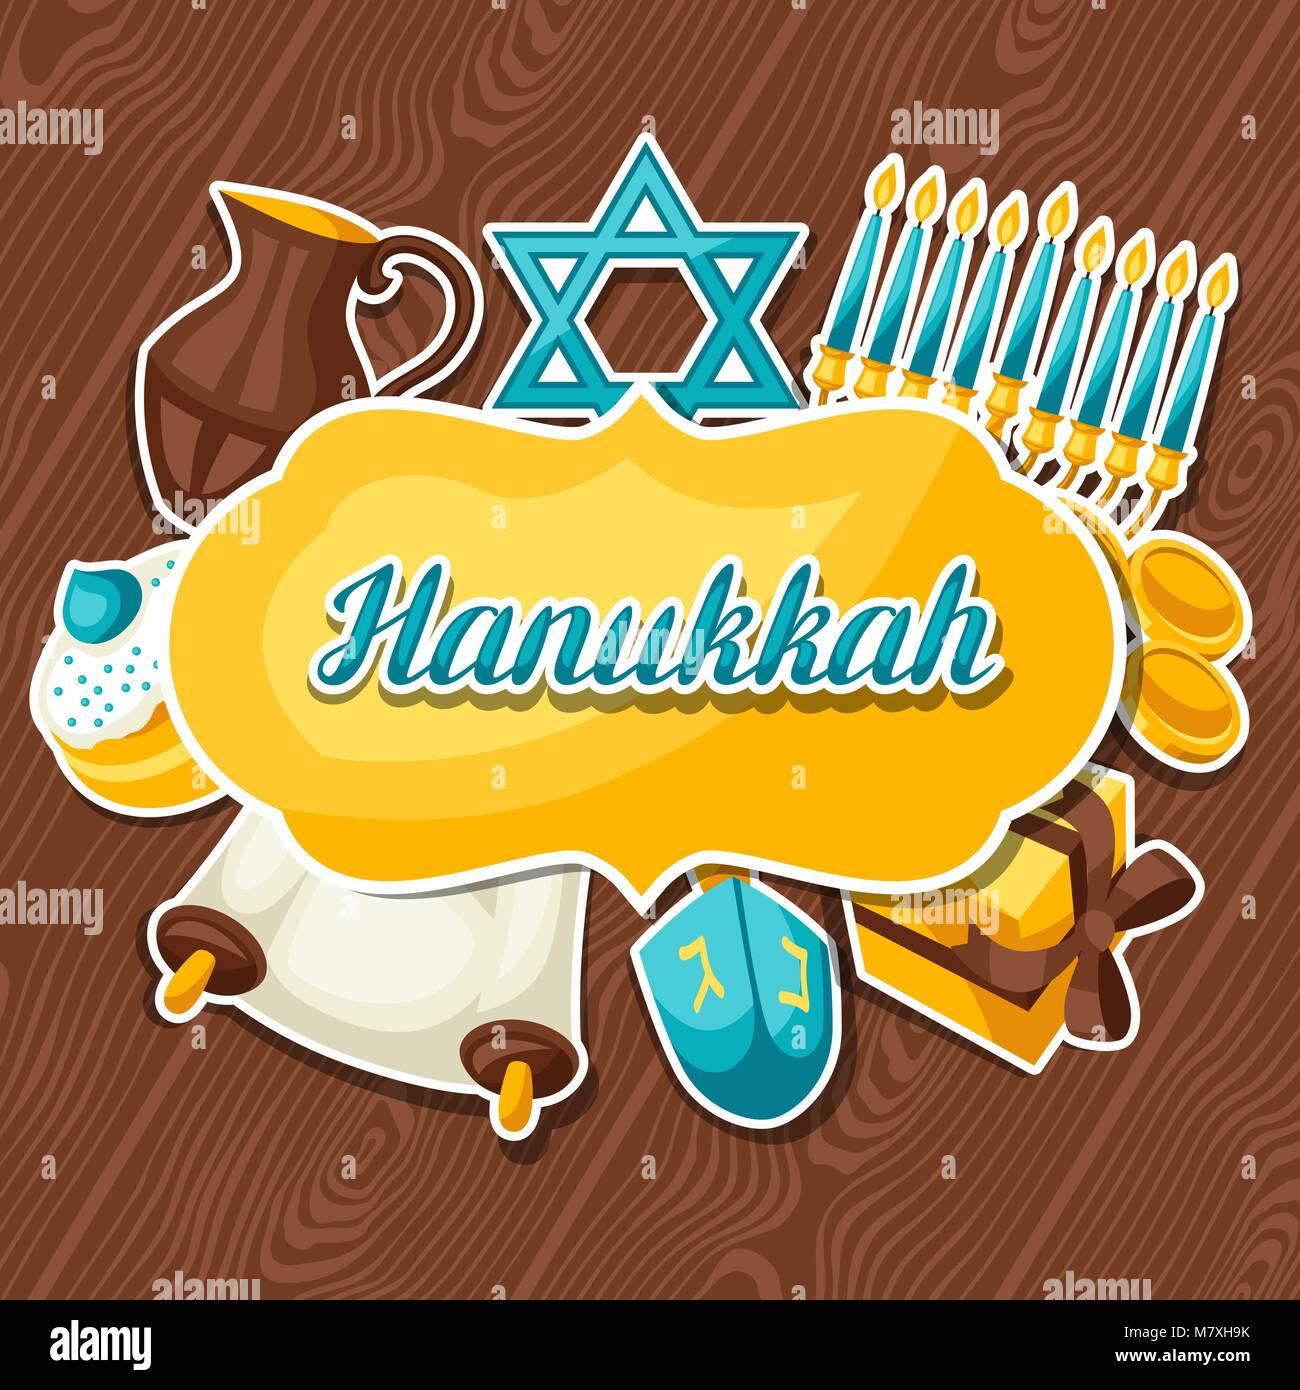 Jewish Hanukkah celebration card with holiday sticker objects - Stock Vector